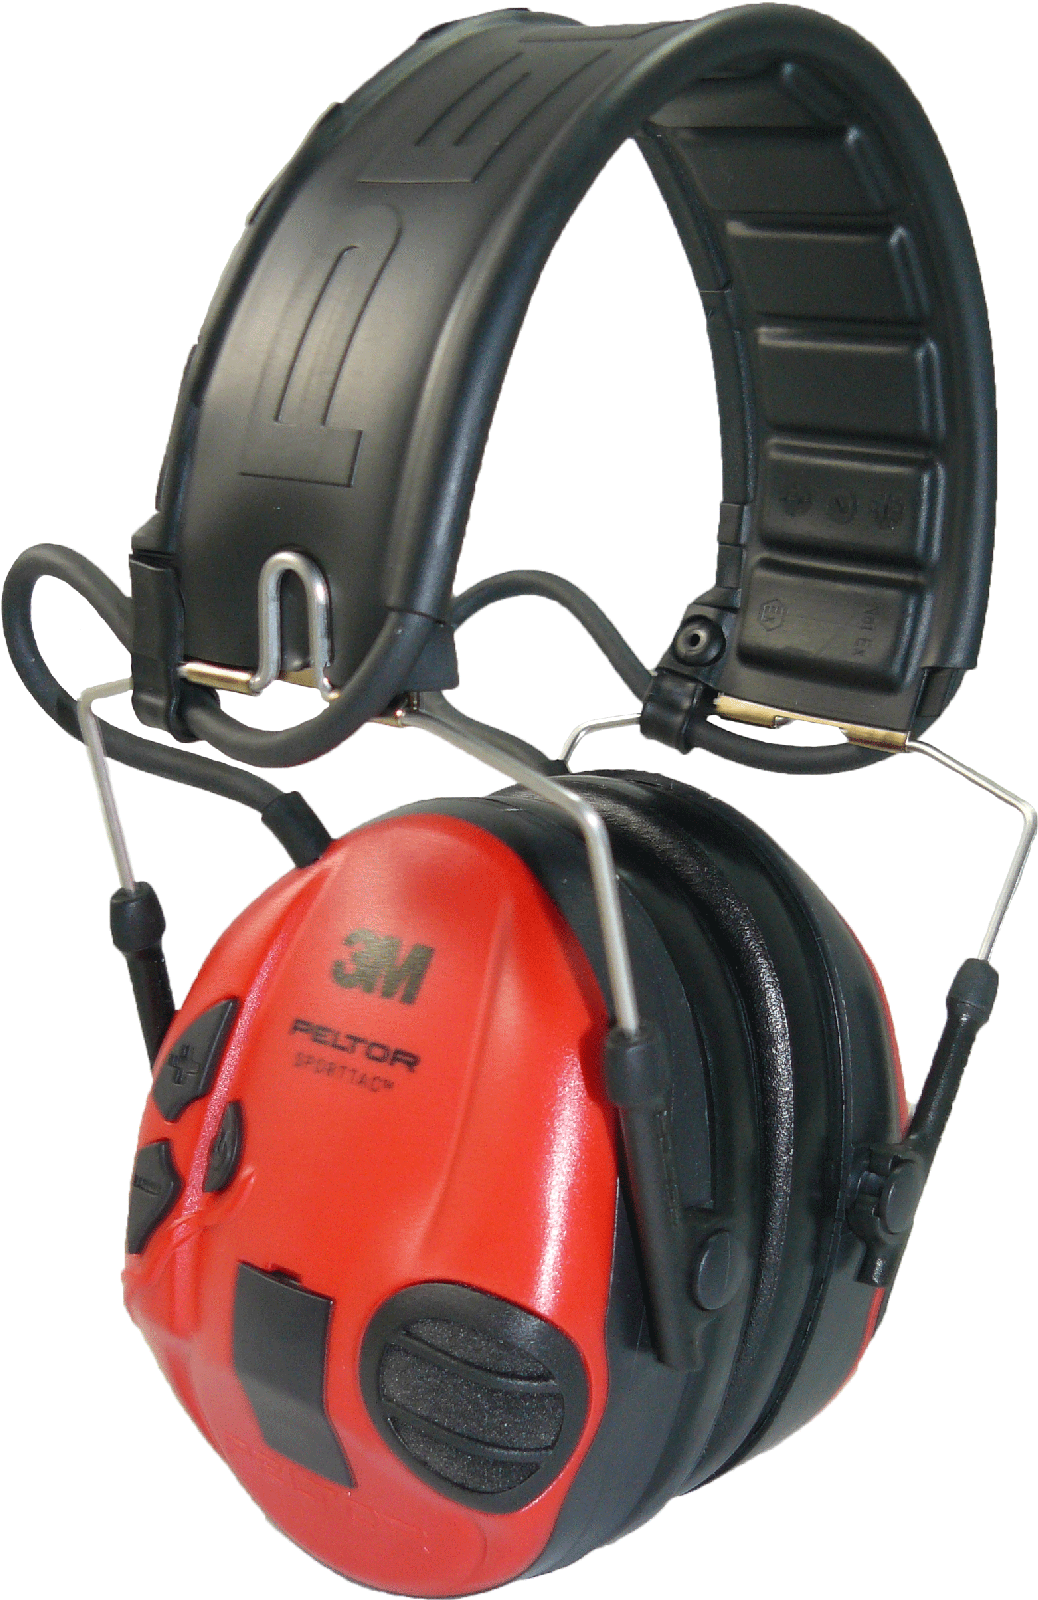 3M Peltor SportTac Electronic Sport Tac Shooting Hunting Ear Muff   eBay